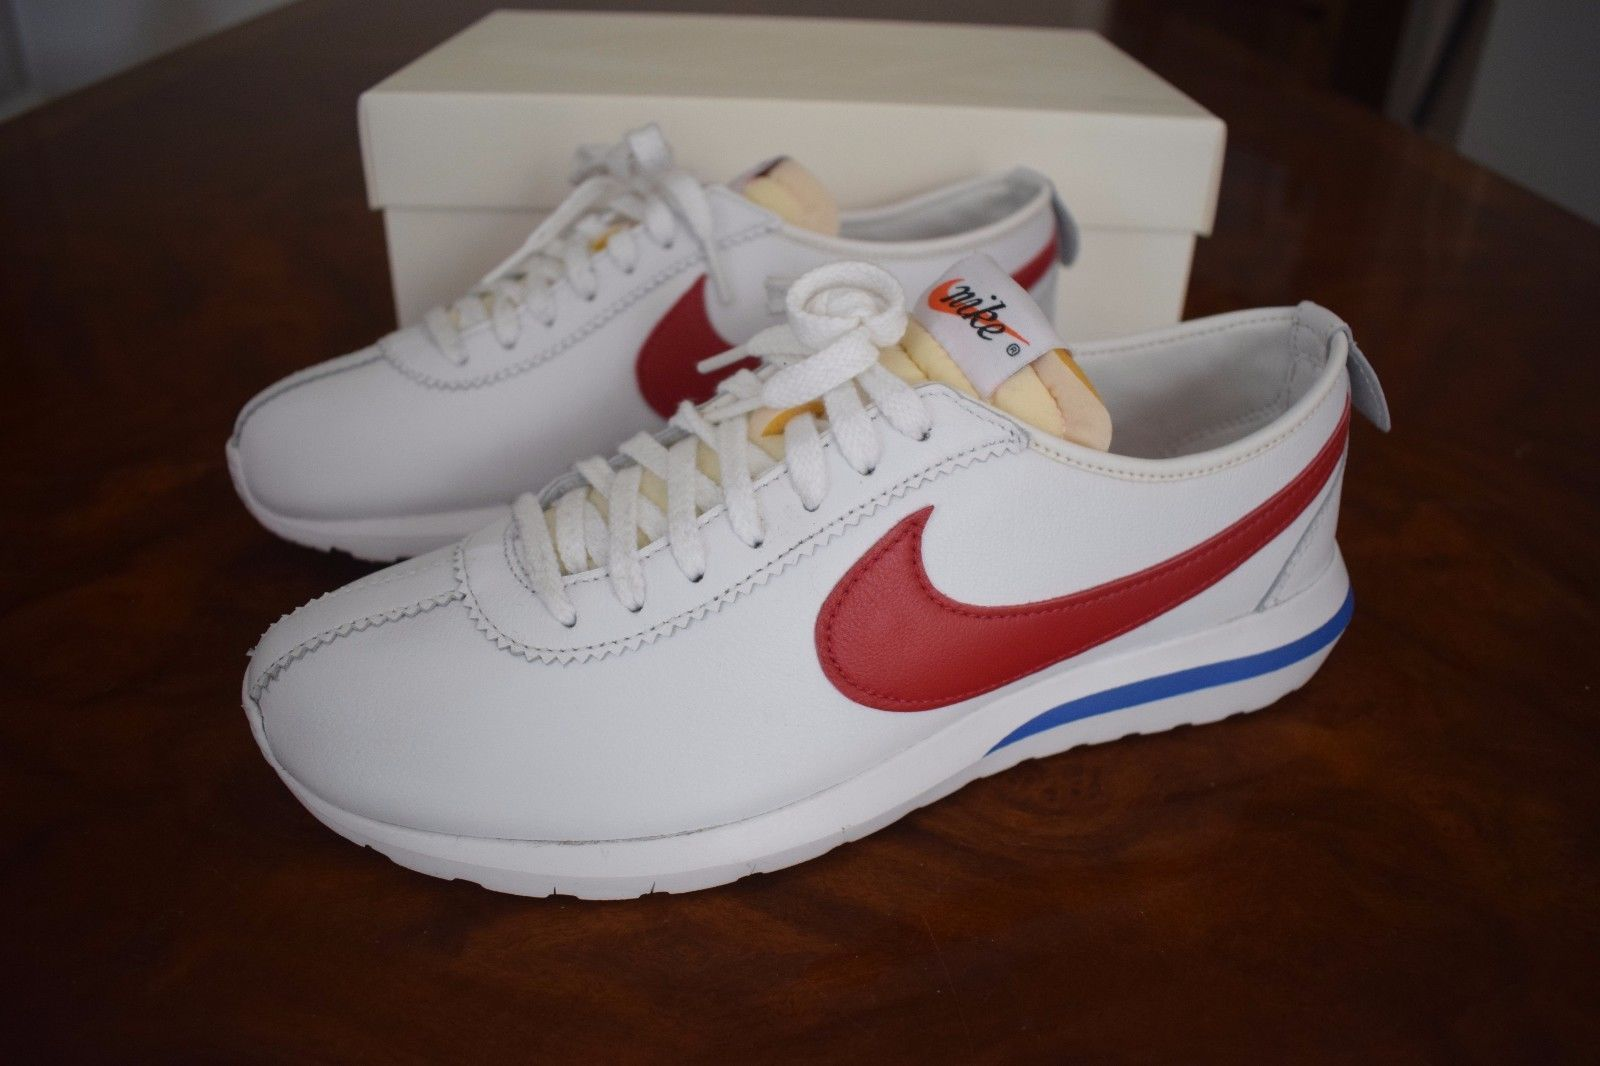 a81333d61e04 Nm Sp Shoes Forrest Gump Men Size Mens Nike Roshe Cortez.